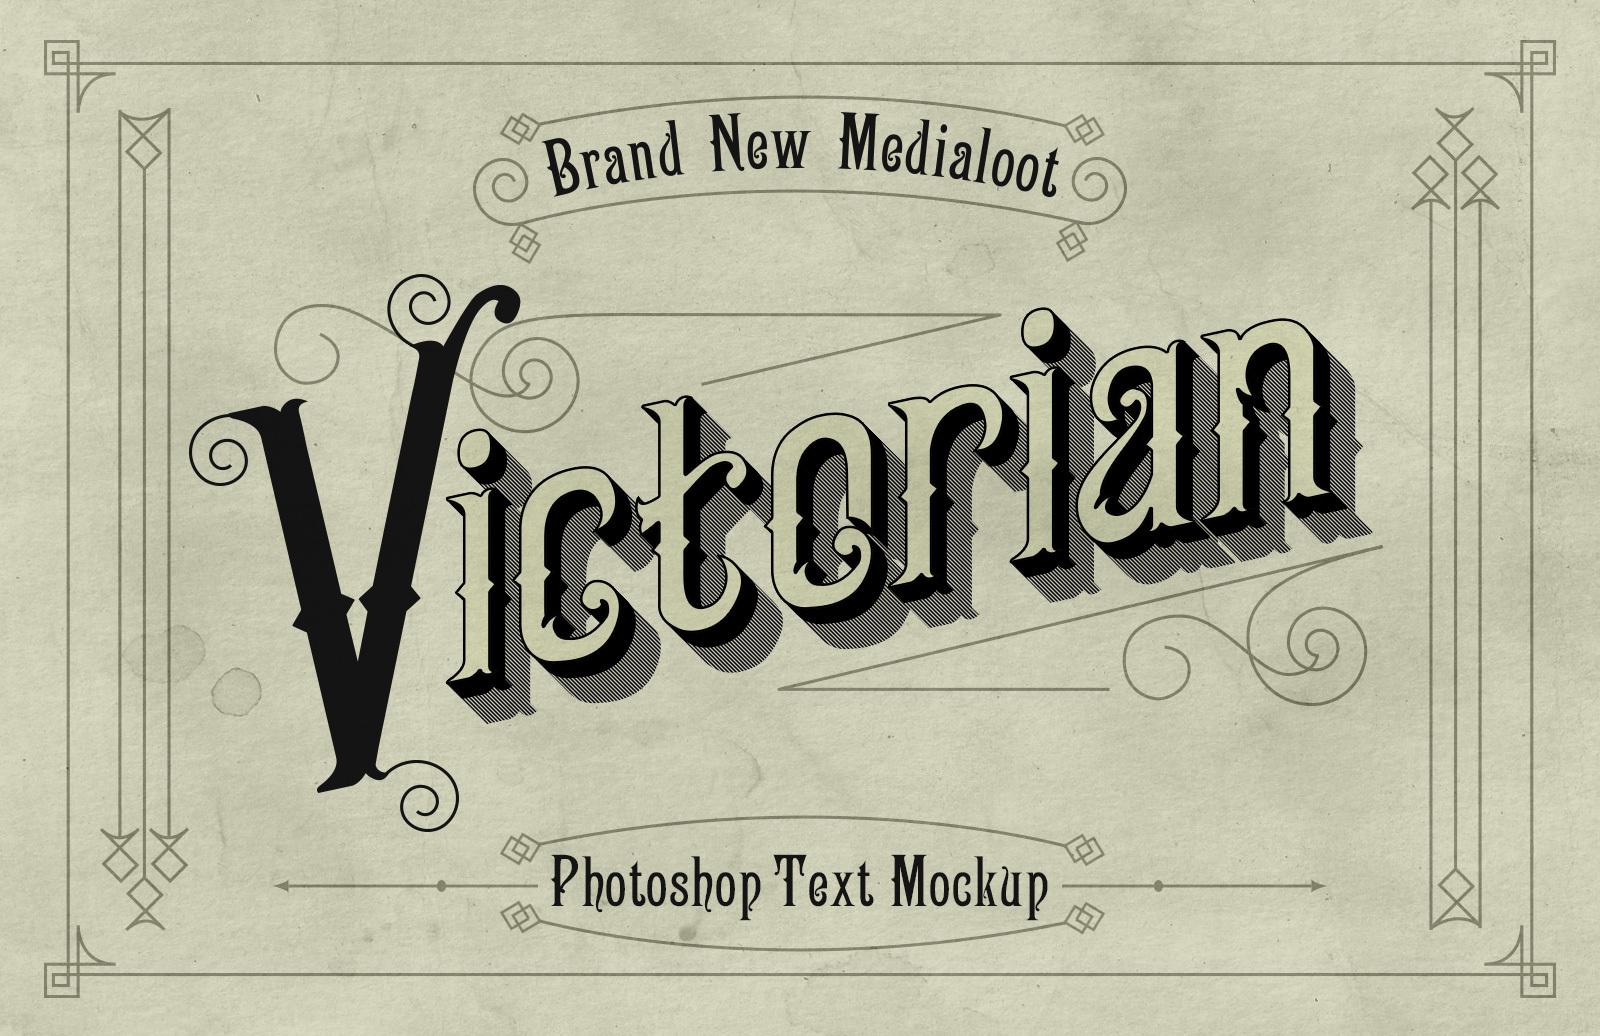 Victorian Text Mockup